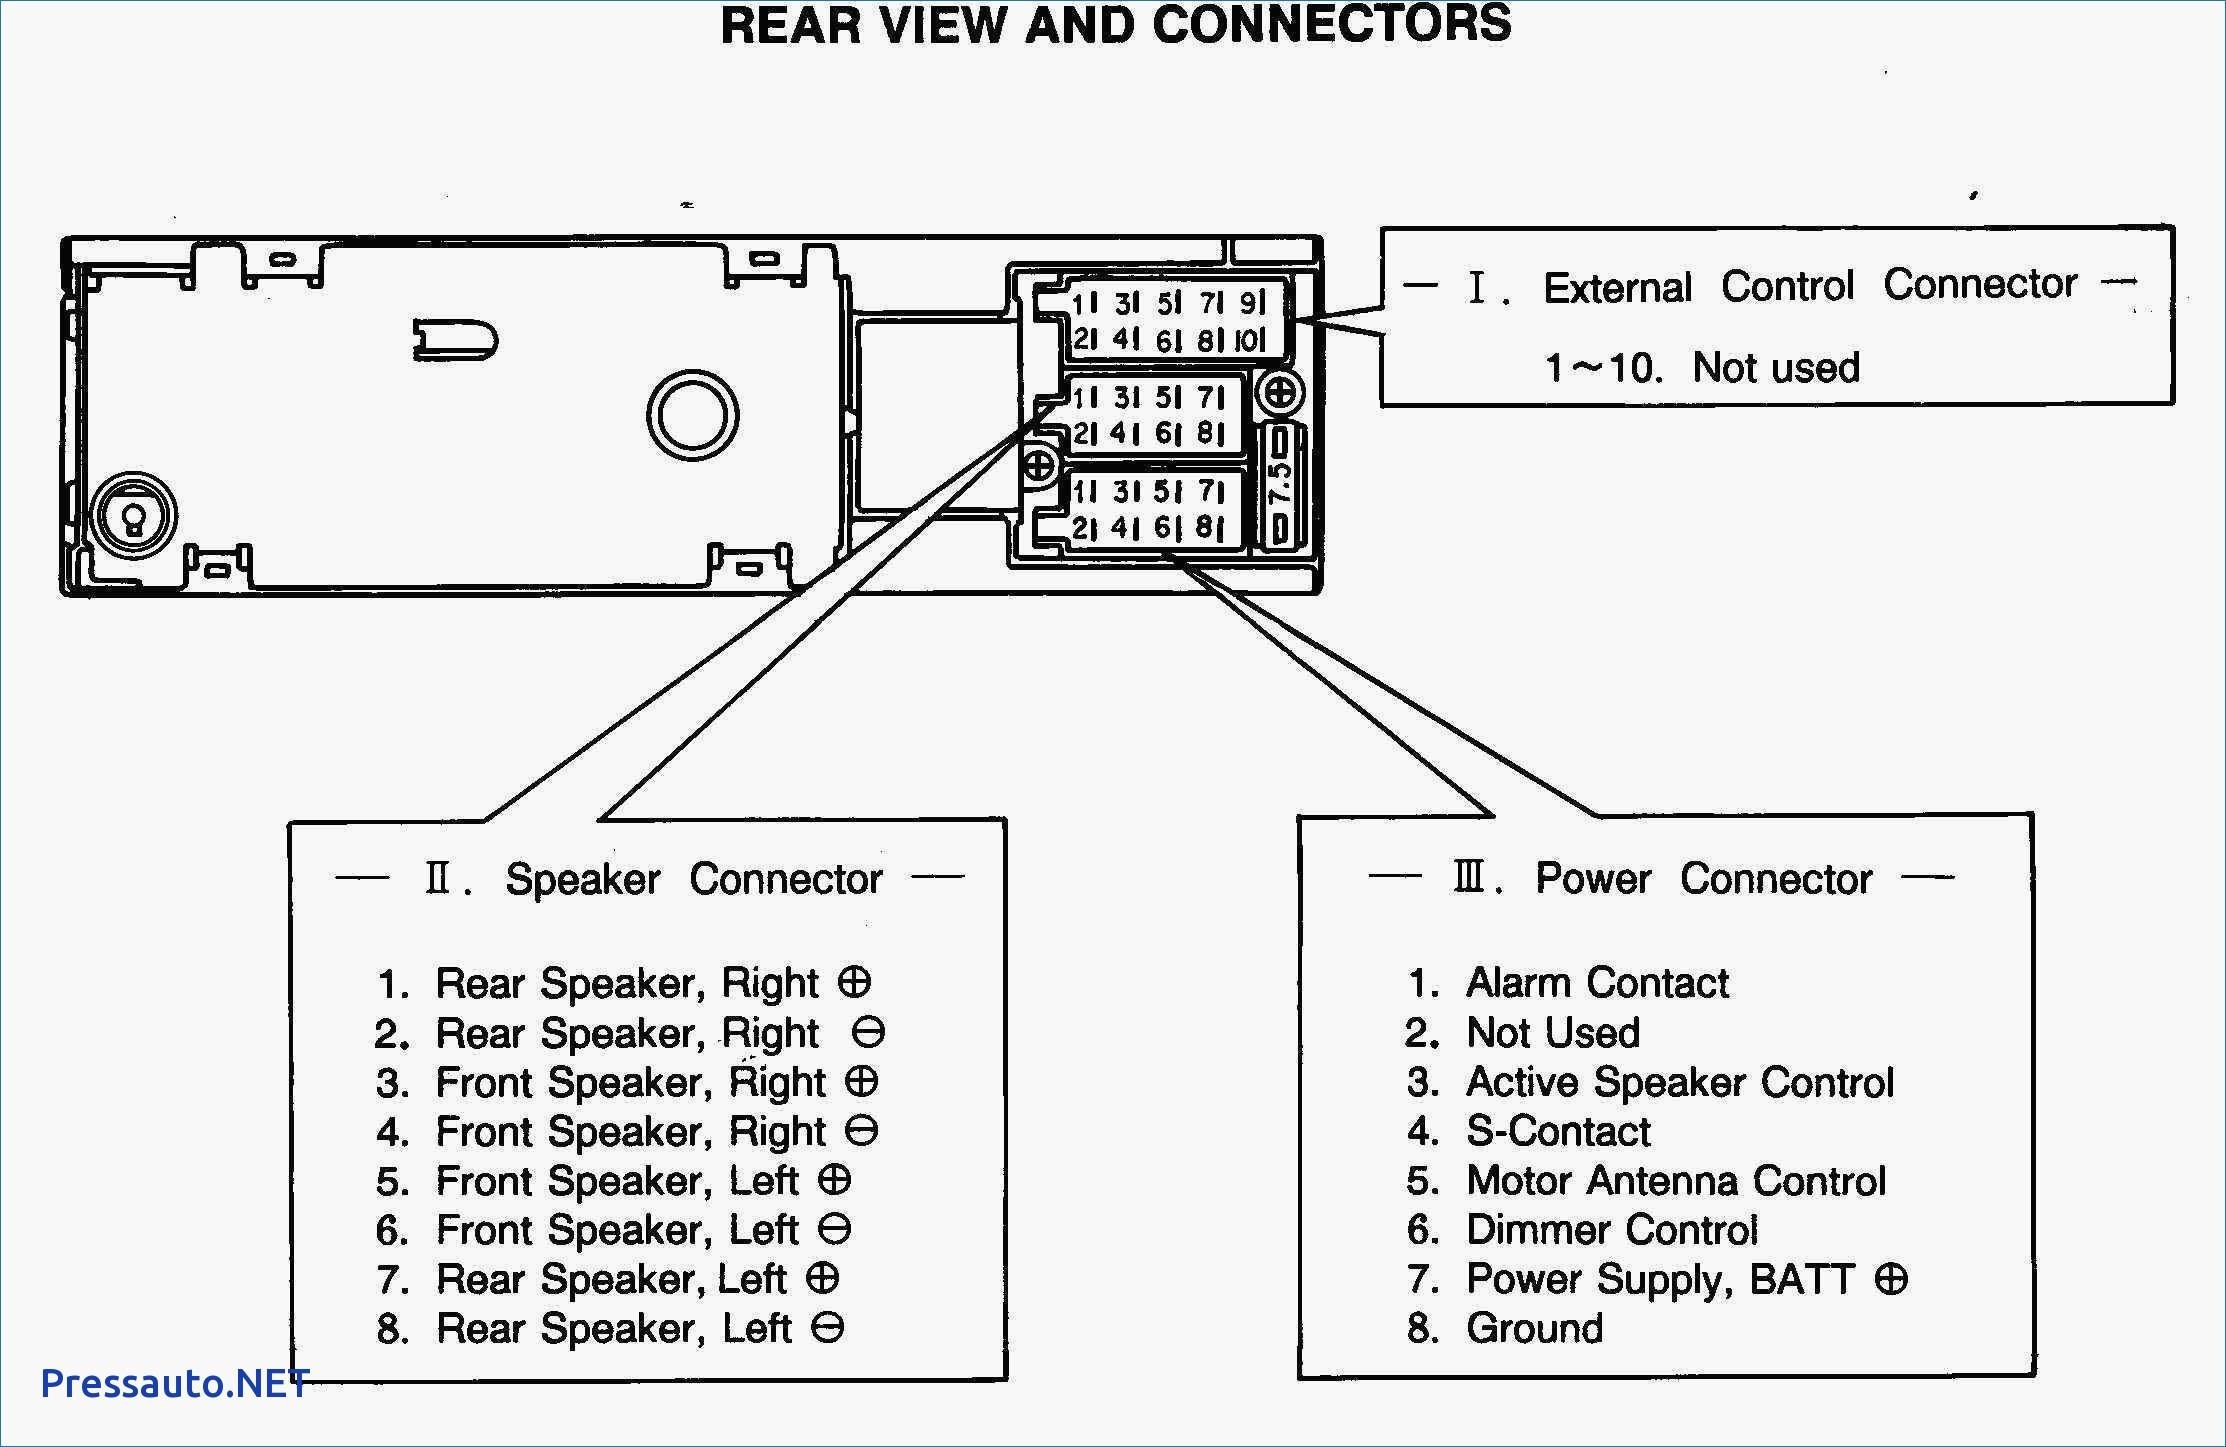 audi symphony 2 wiring diagram ea 4015  audi 4 2 abz wiring diagram free diagram  ea 4015  audi 4 2 abz wiring diagram